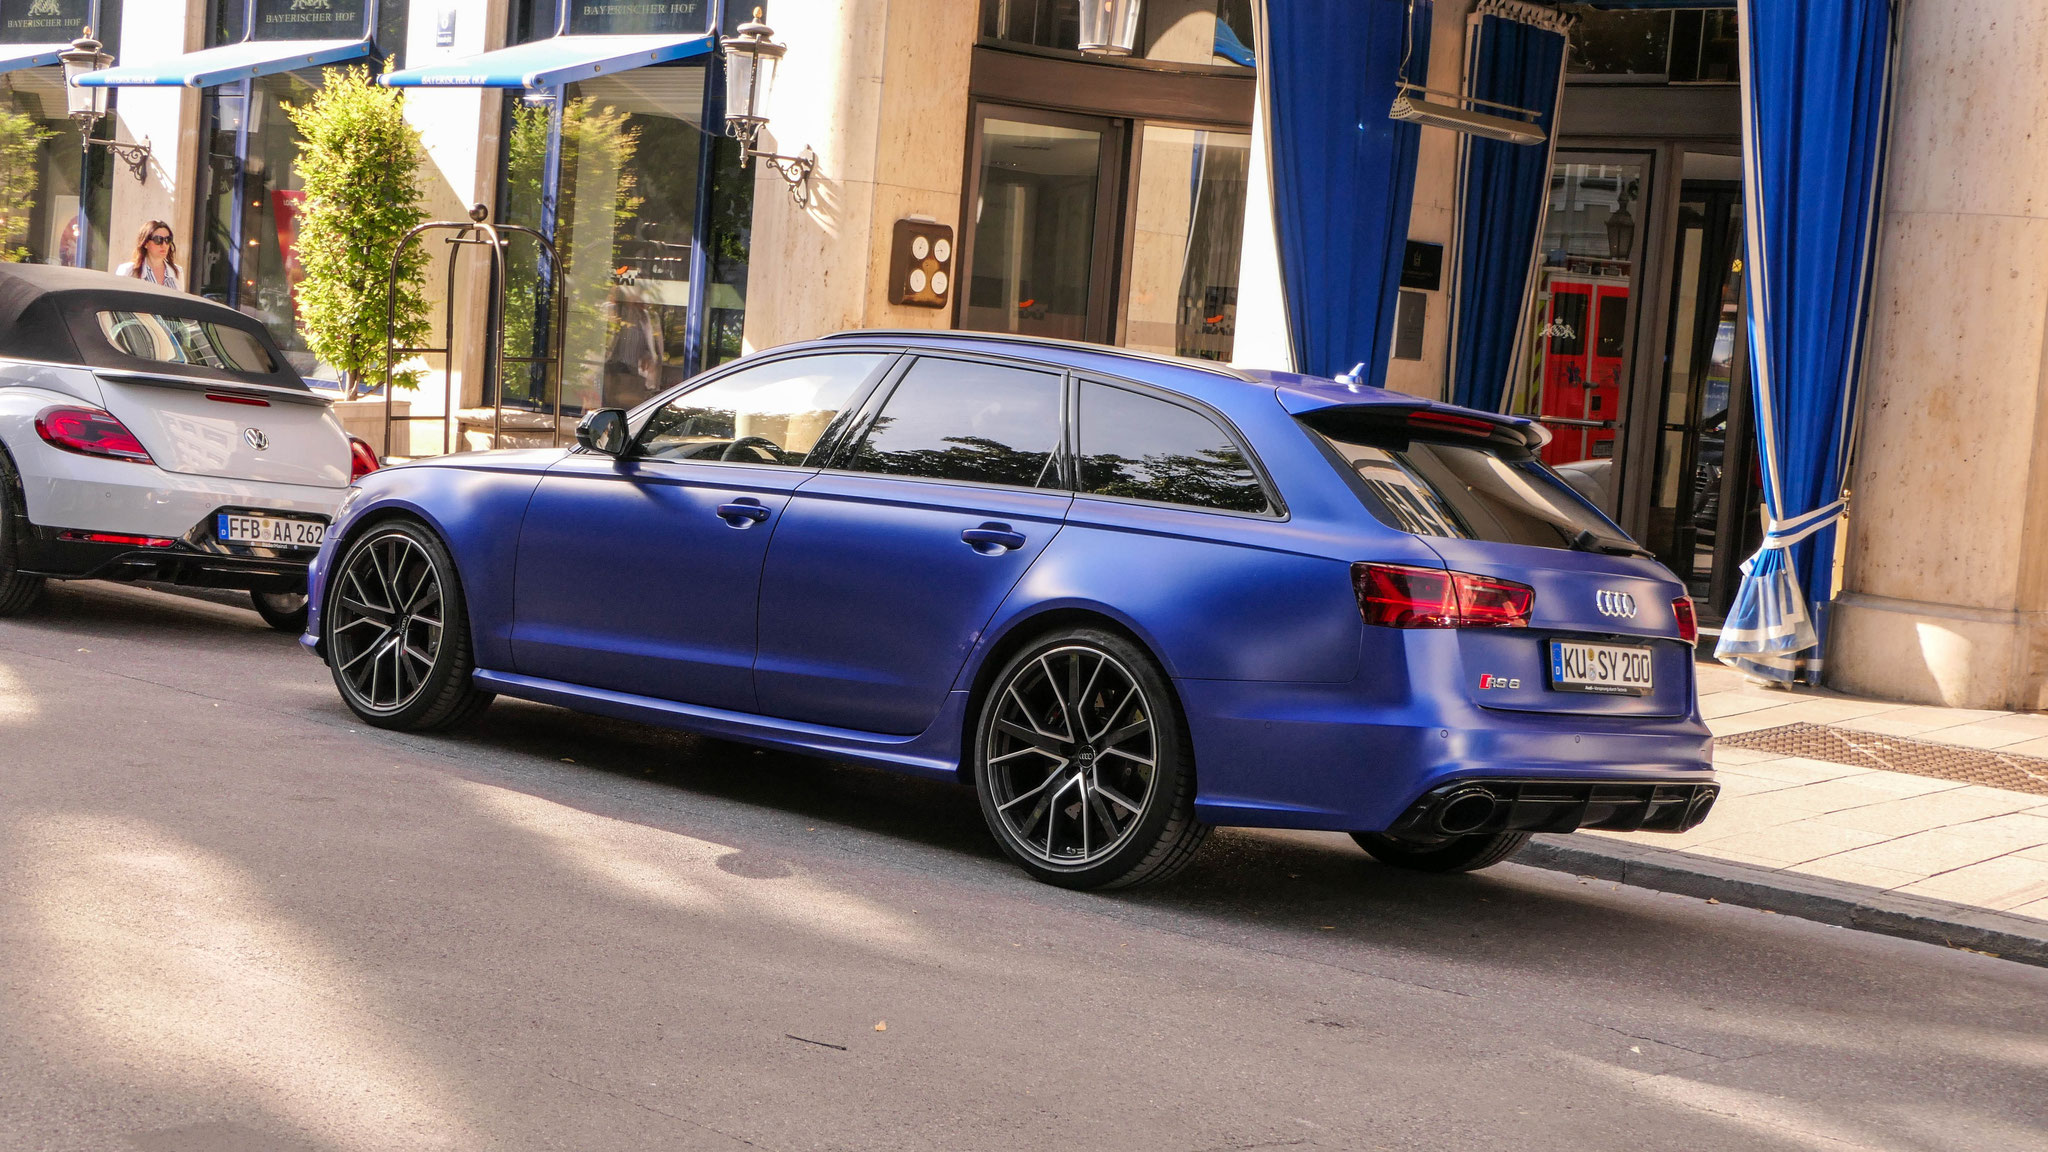 Audi RS6 - KÜ-SY-200